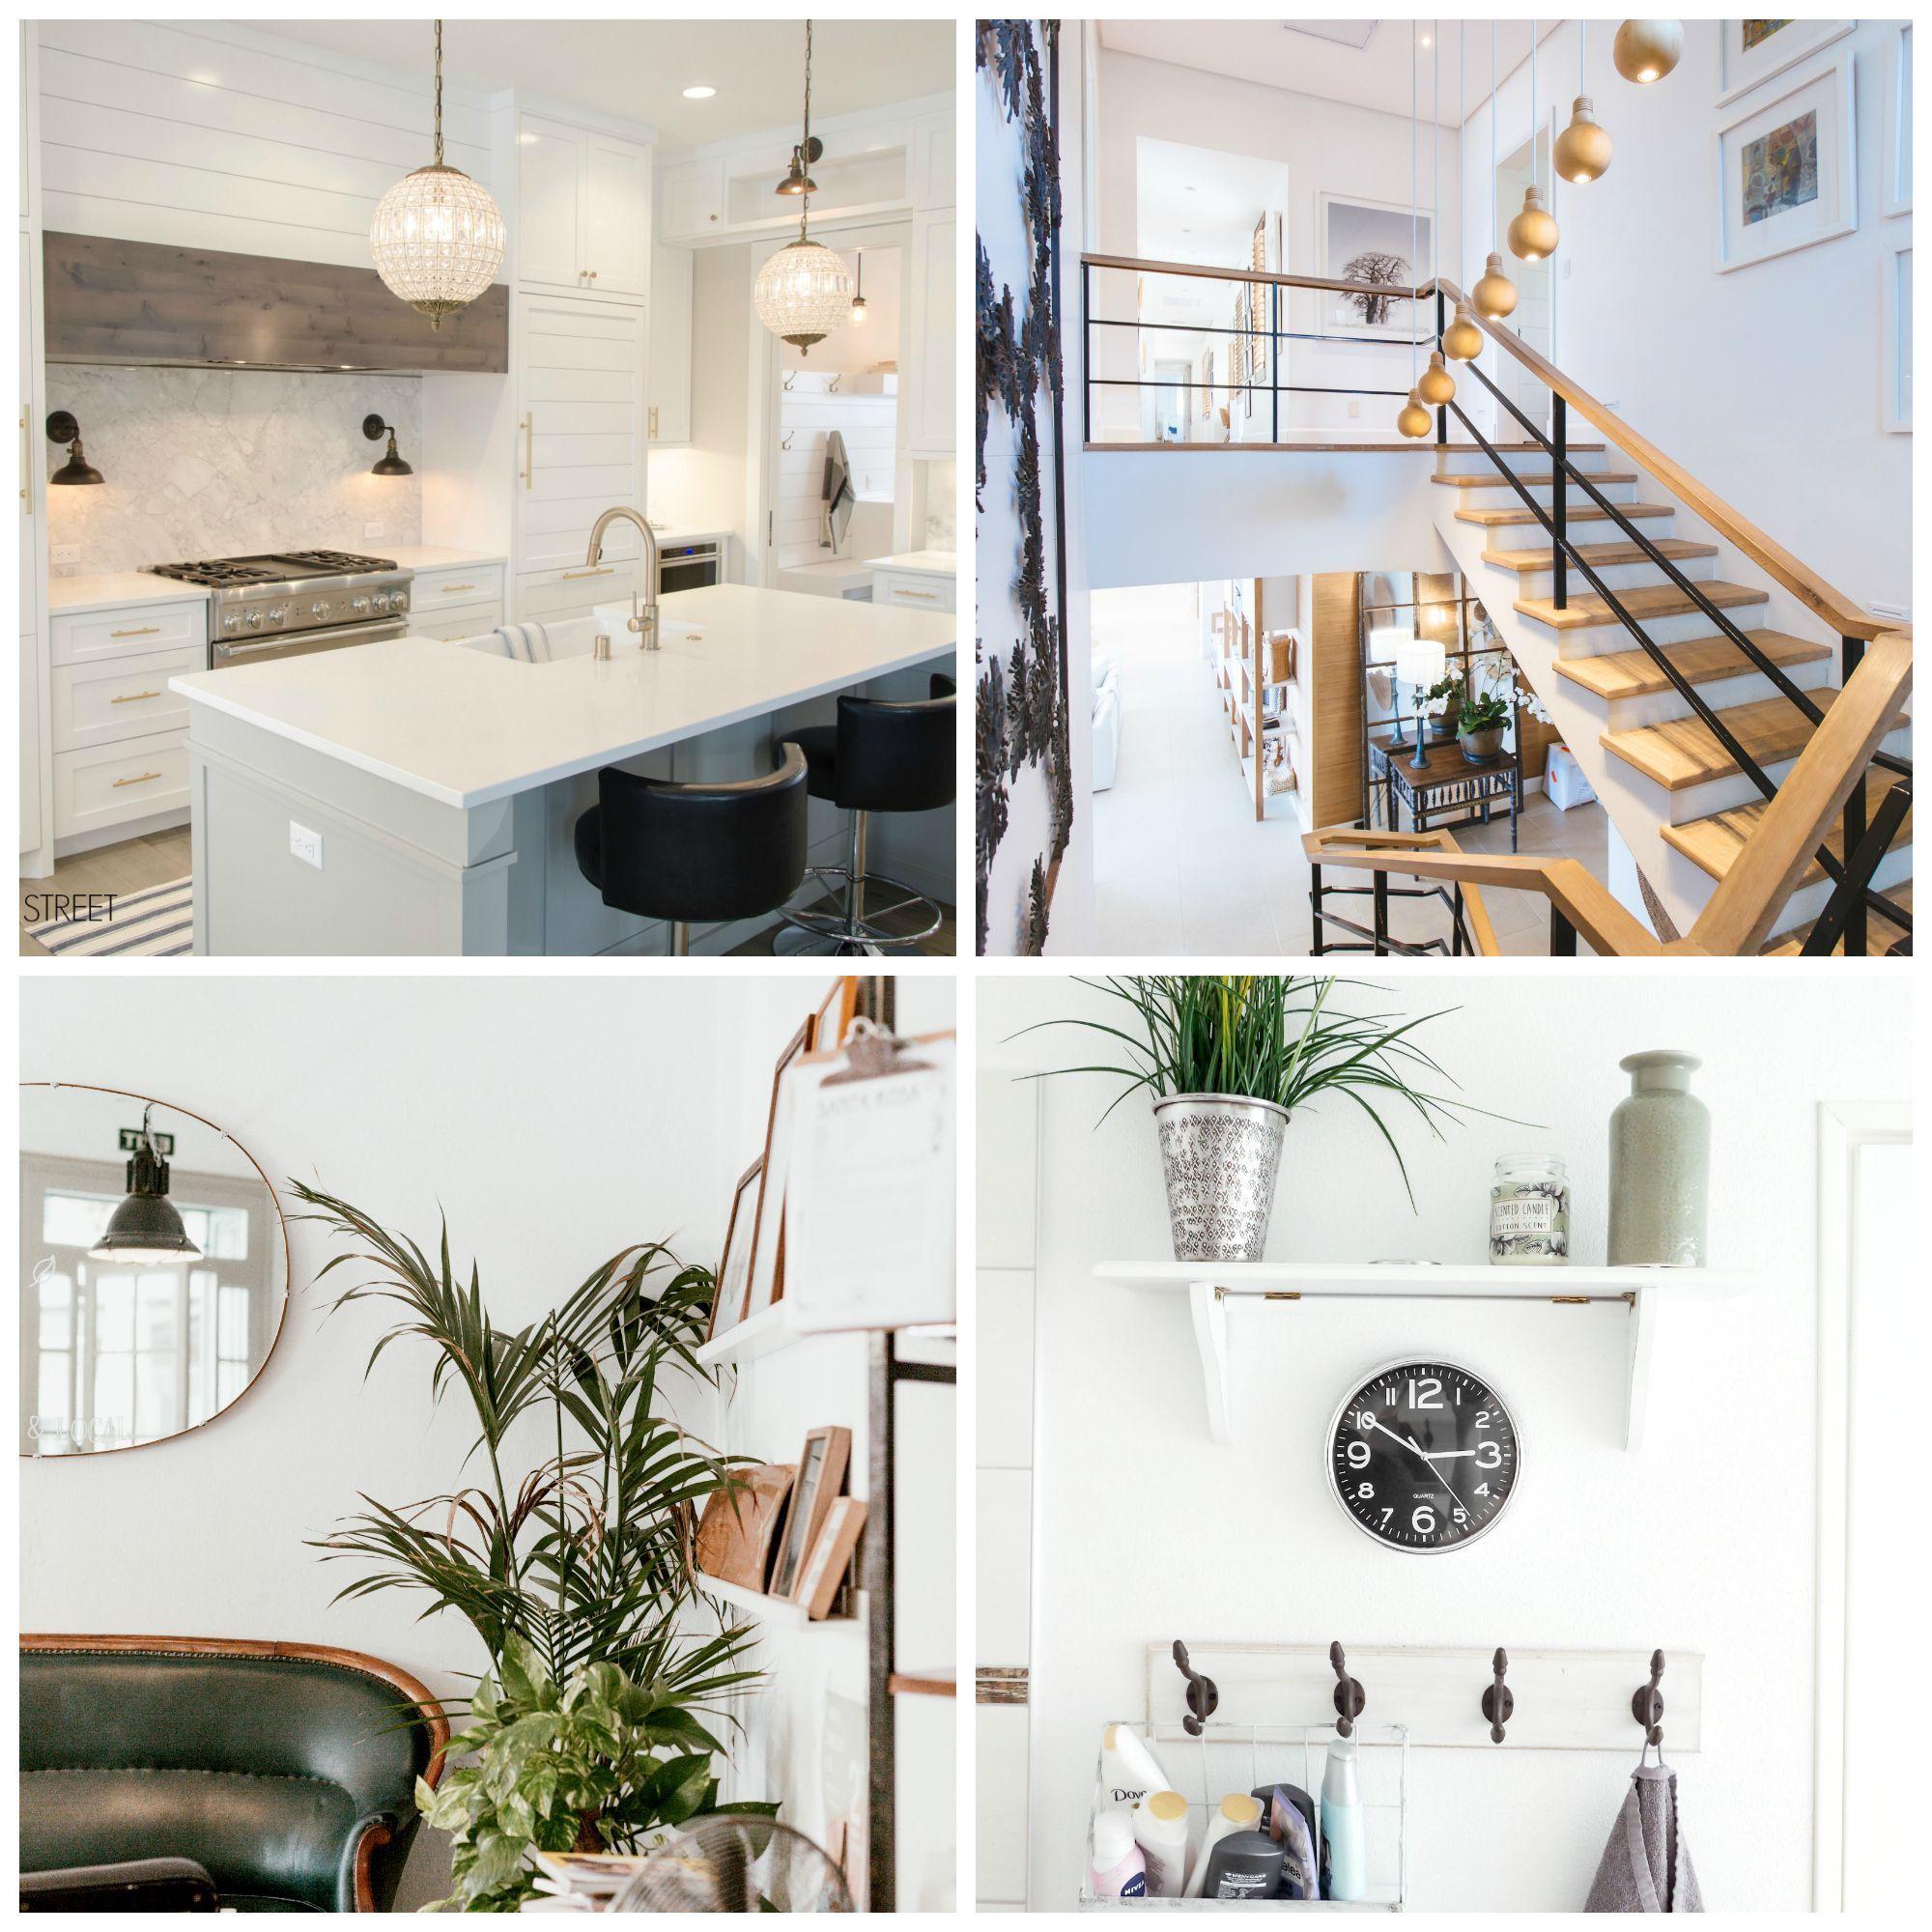 Awesome home decor ideas rustic farmhouse minimalist modern also rh pinterest